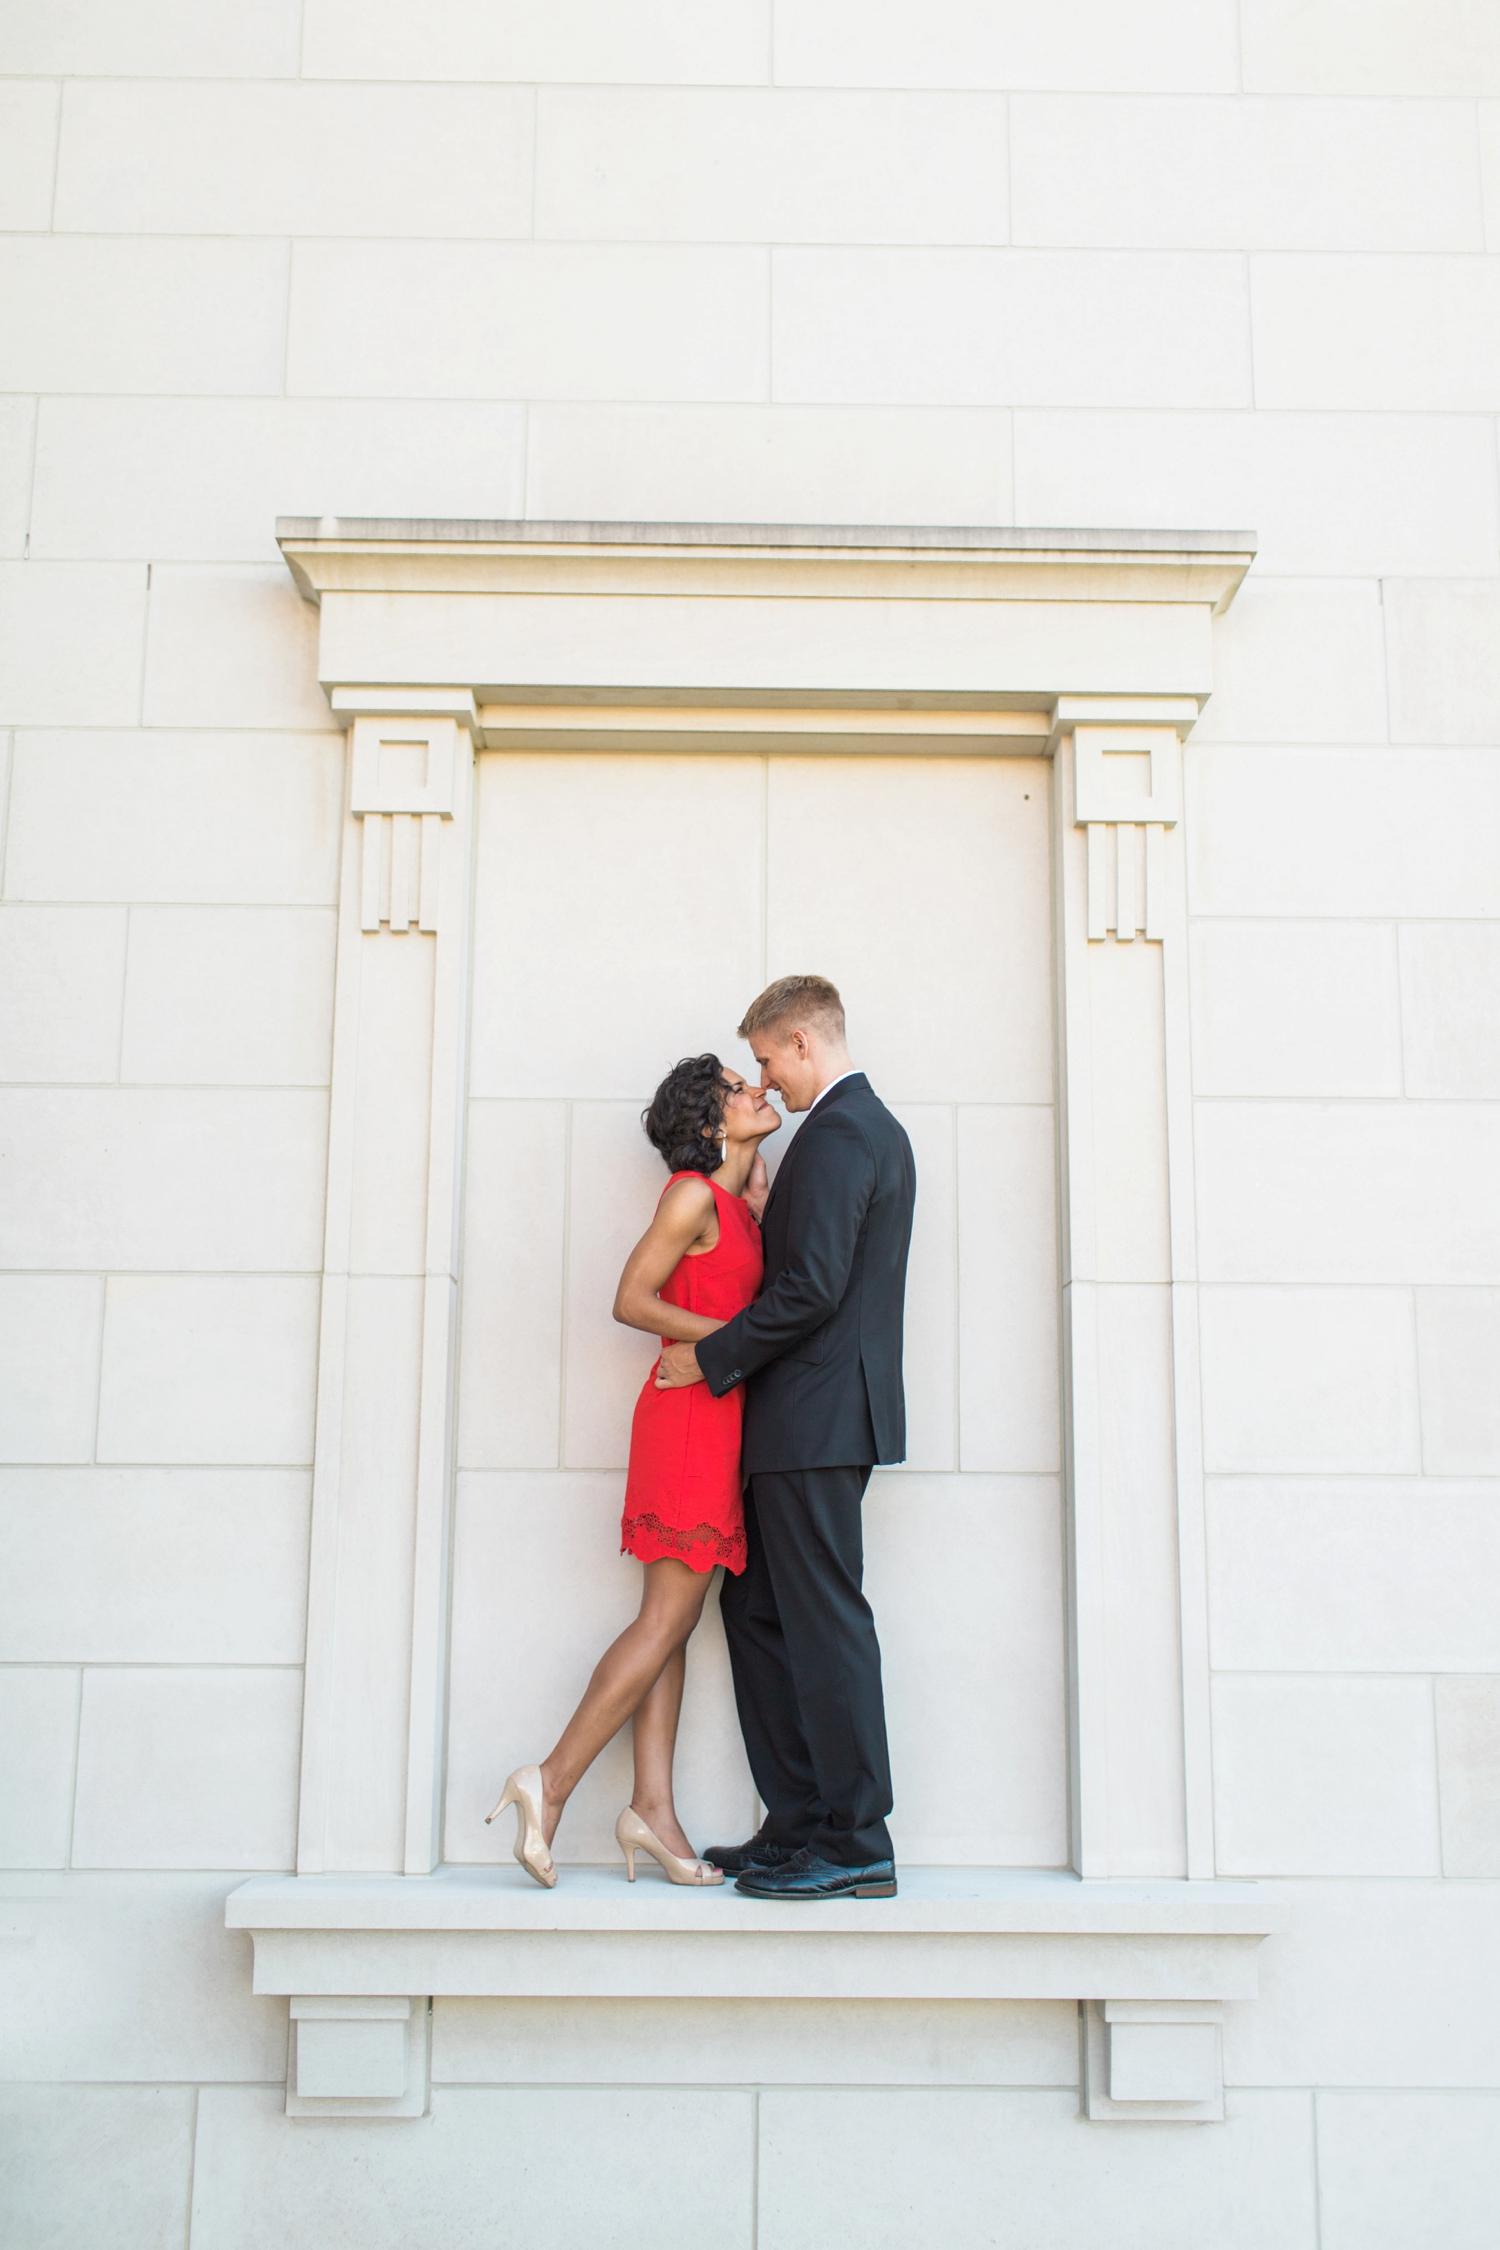 The_Palladium_Carmel_Indiana_Engagement_Photos_Chloe_Luka_Photography_7264.jpg